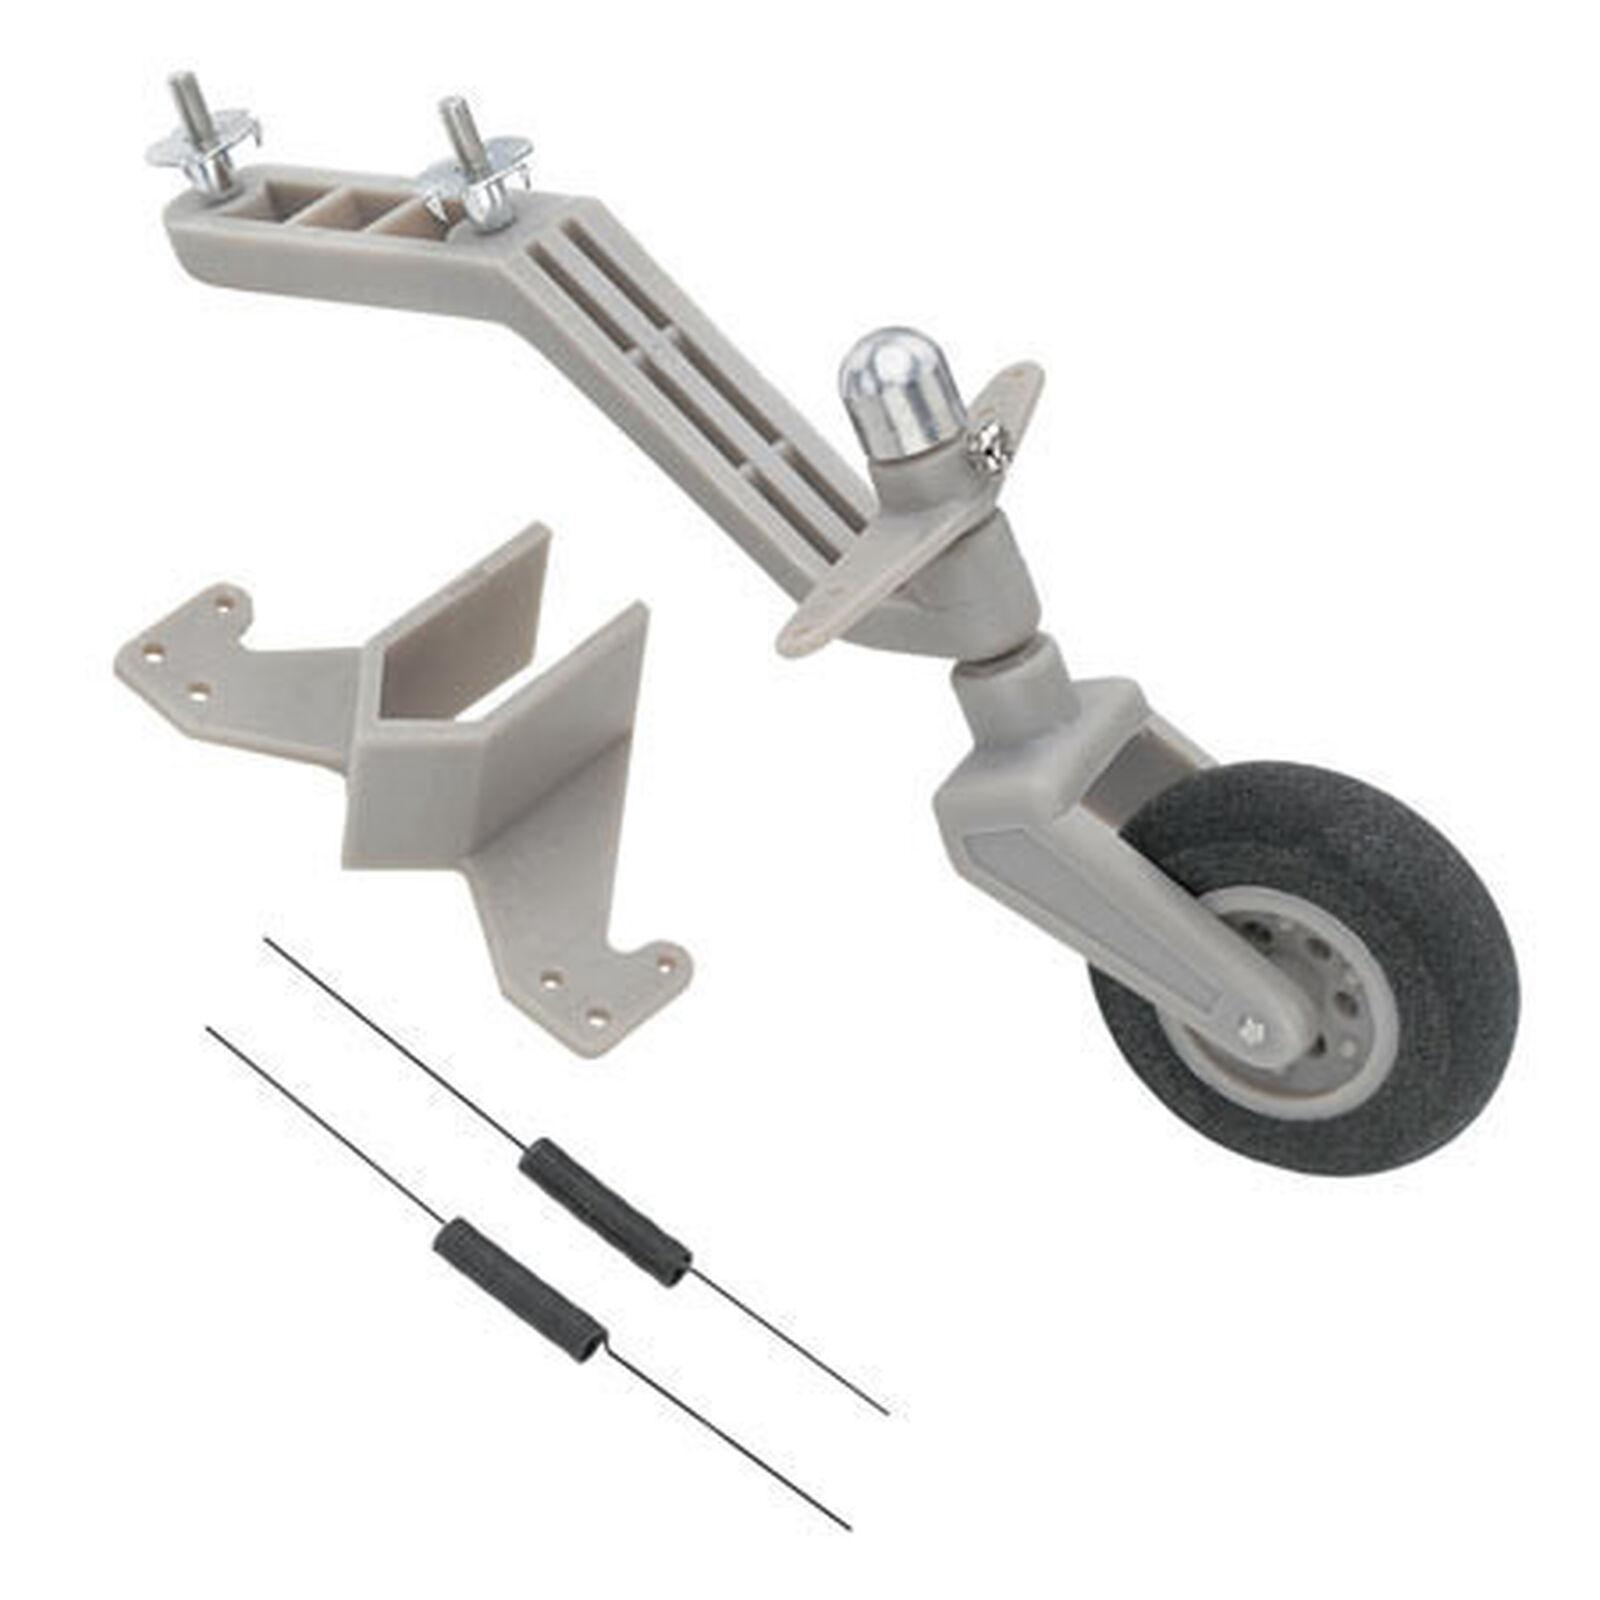 Semi-Scale Tailwheel System: 40-90